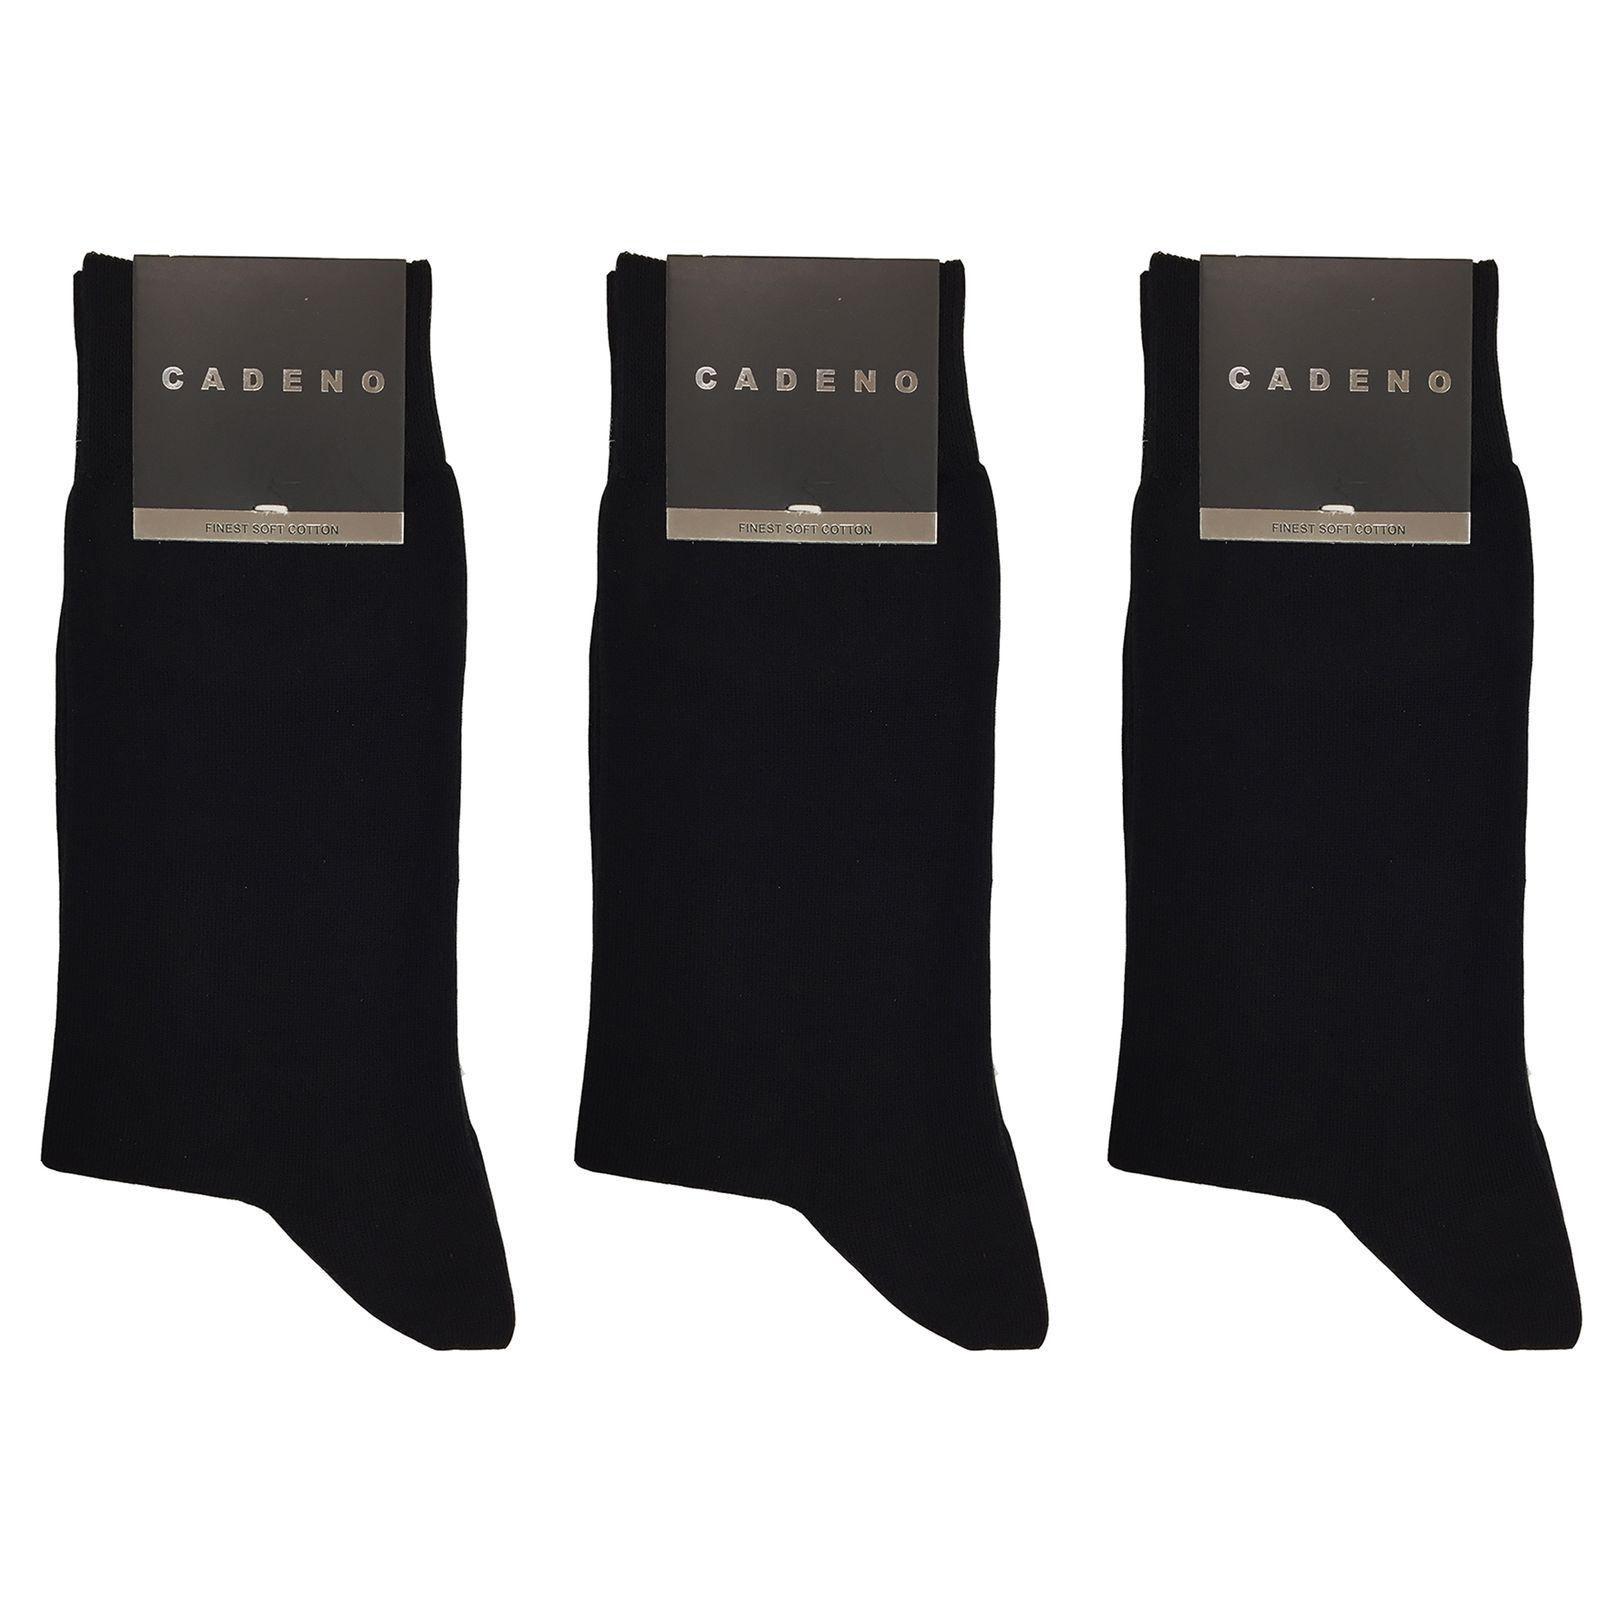 جوراب مردانه کادنو کد CA1090 بسته 3 عددی -  - 2